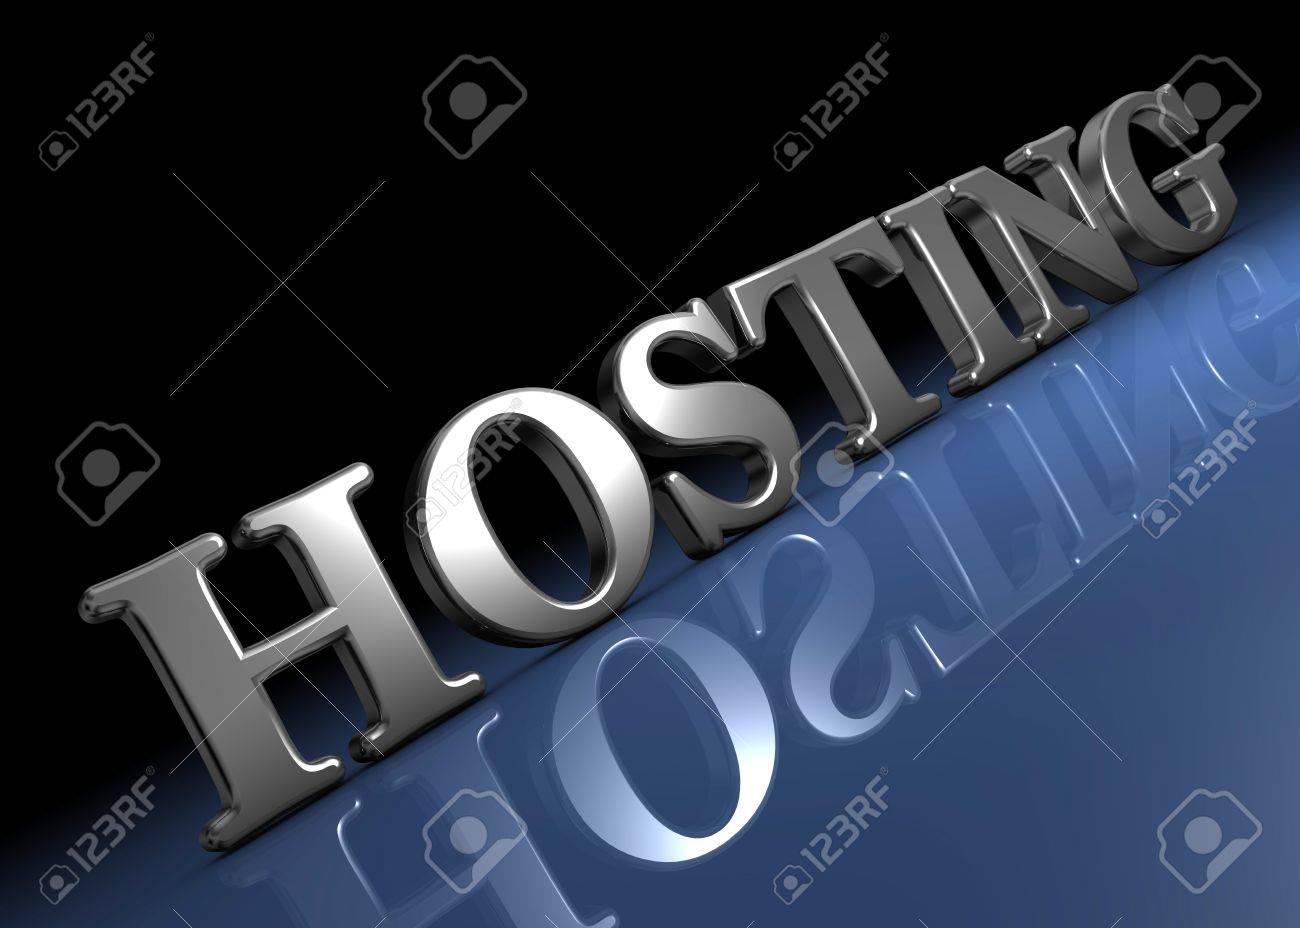 Hosting Standard-Bild - 8579196